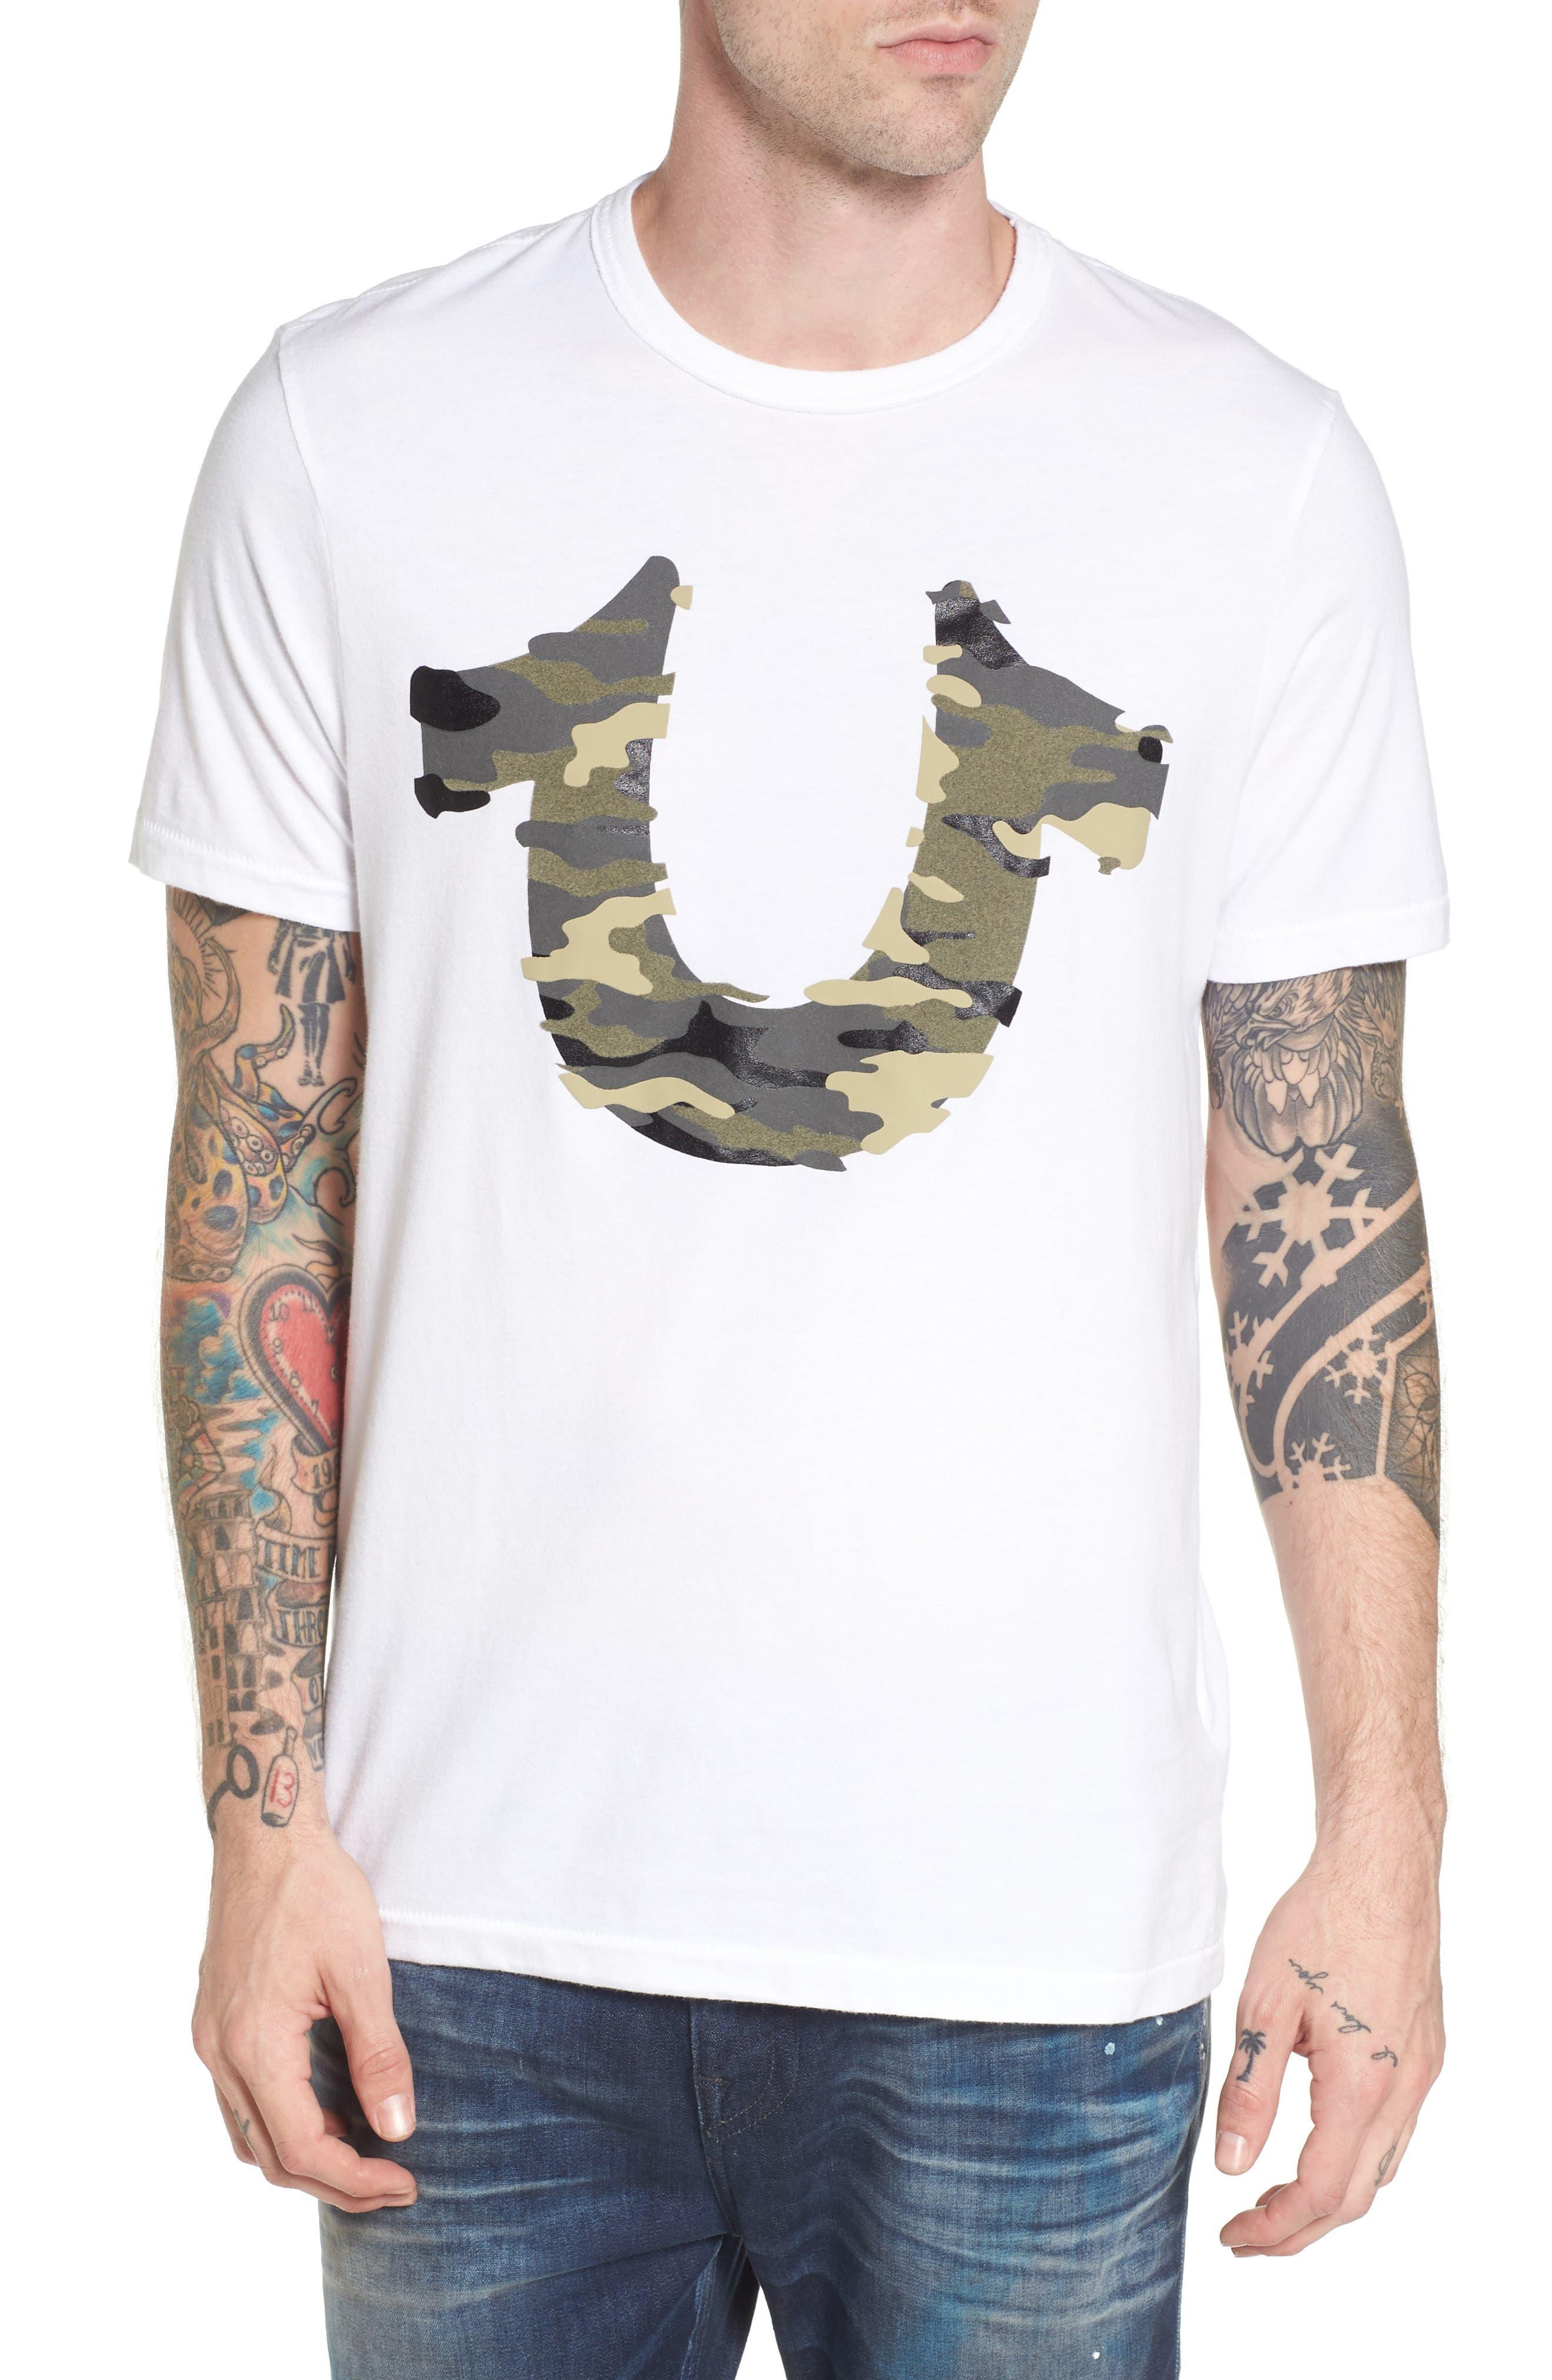 Main Image - True Religion Brand Jeans 3D Camo Graphic T-Shirt